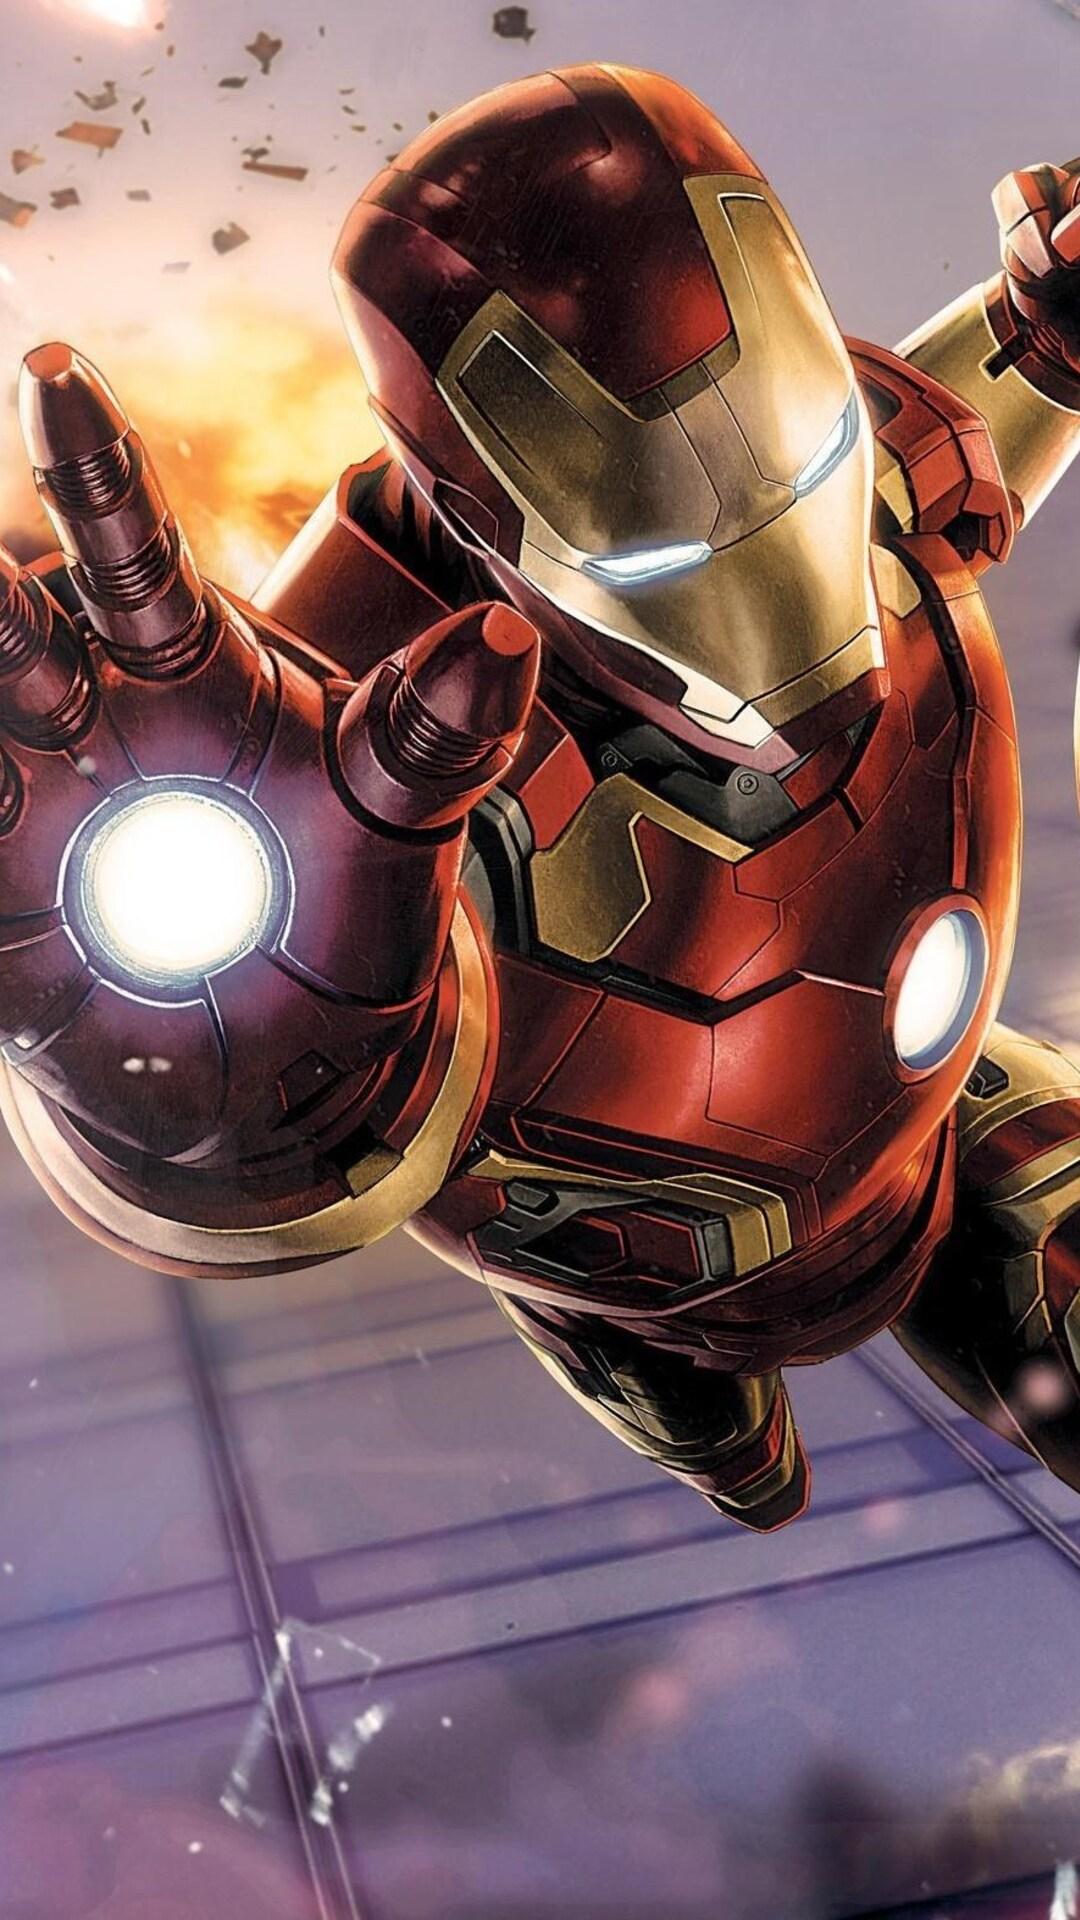 1080x1920 Iron Man Avengers Iphone 7,6s,6 Plus, Pixel xl ...